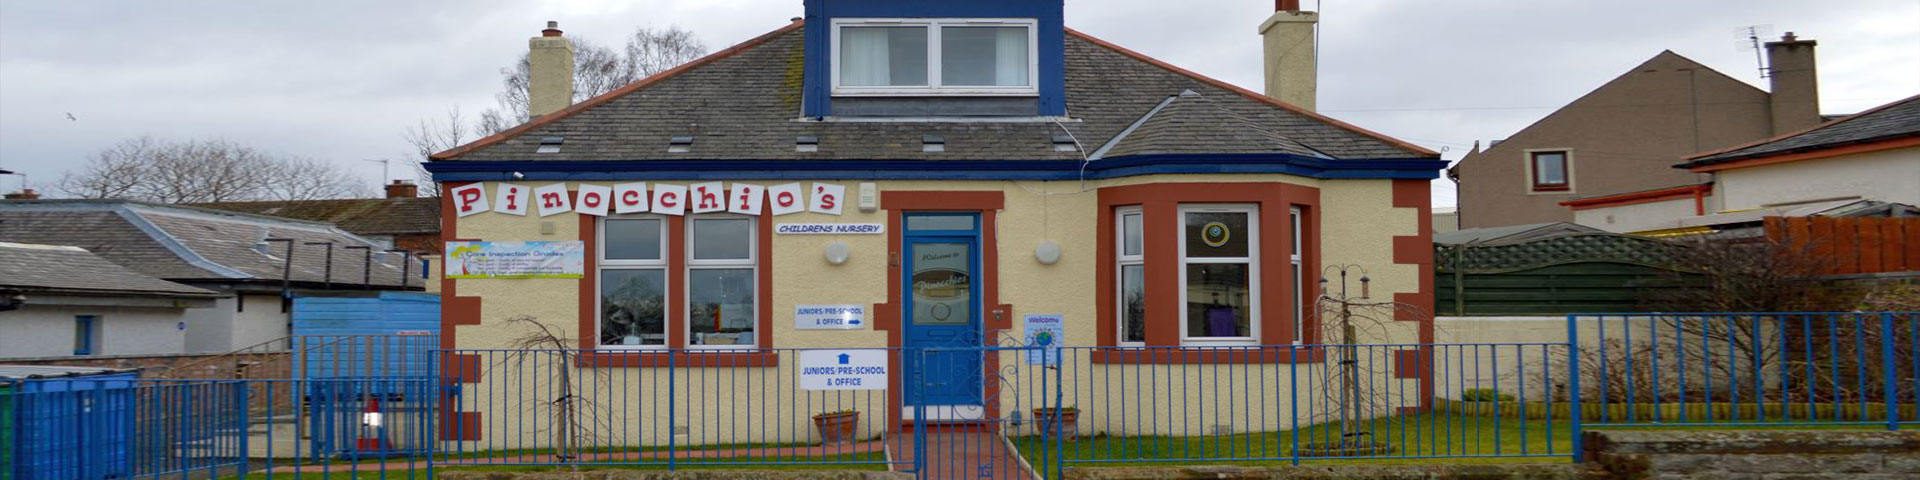 Gilmerton Day Nursery, Edinburgh